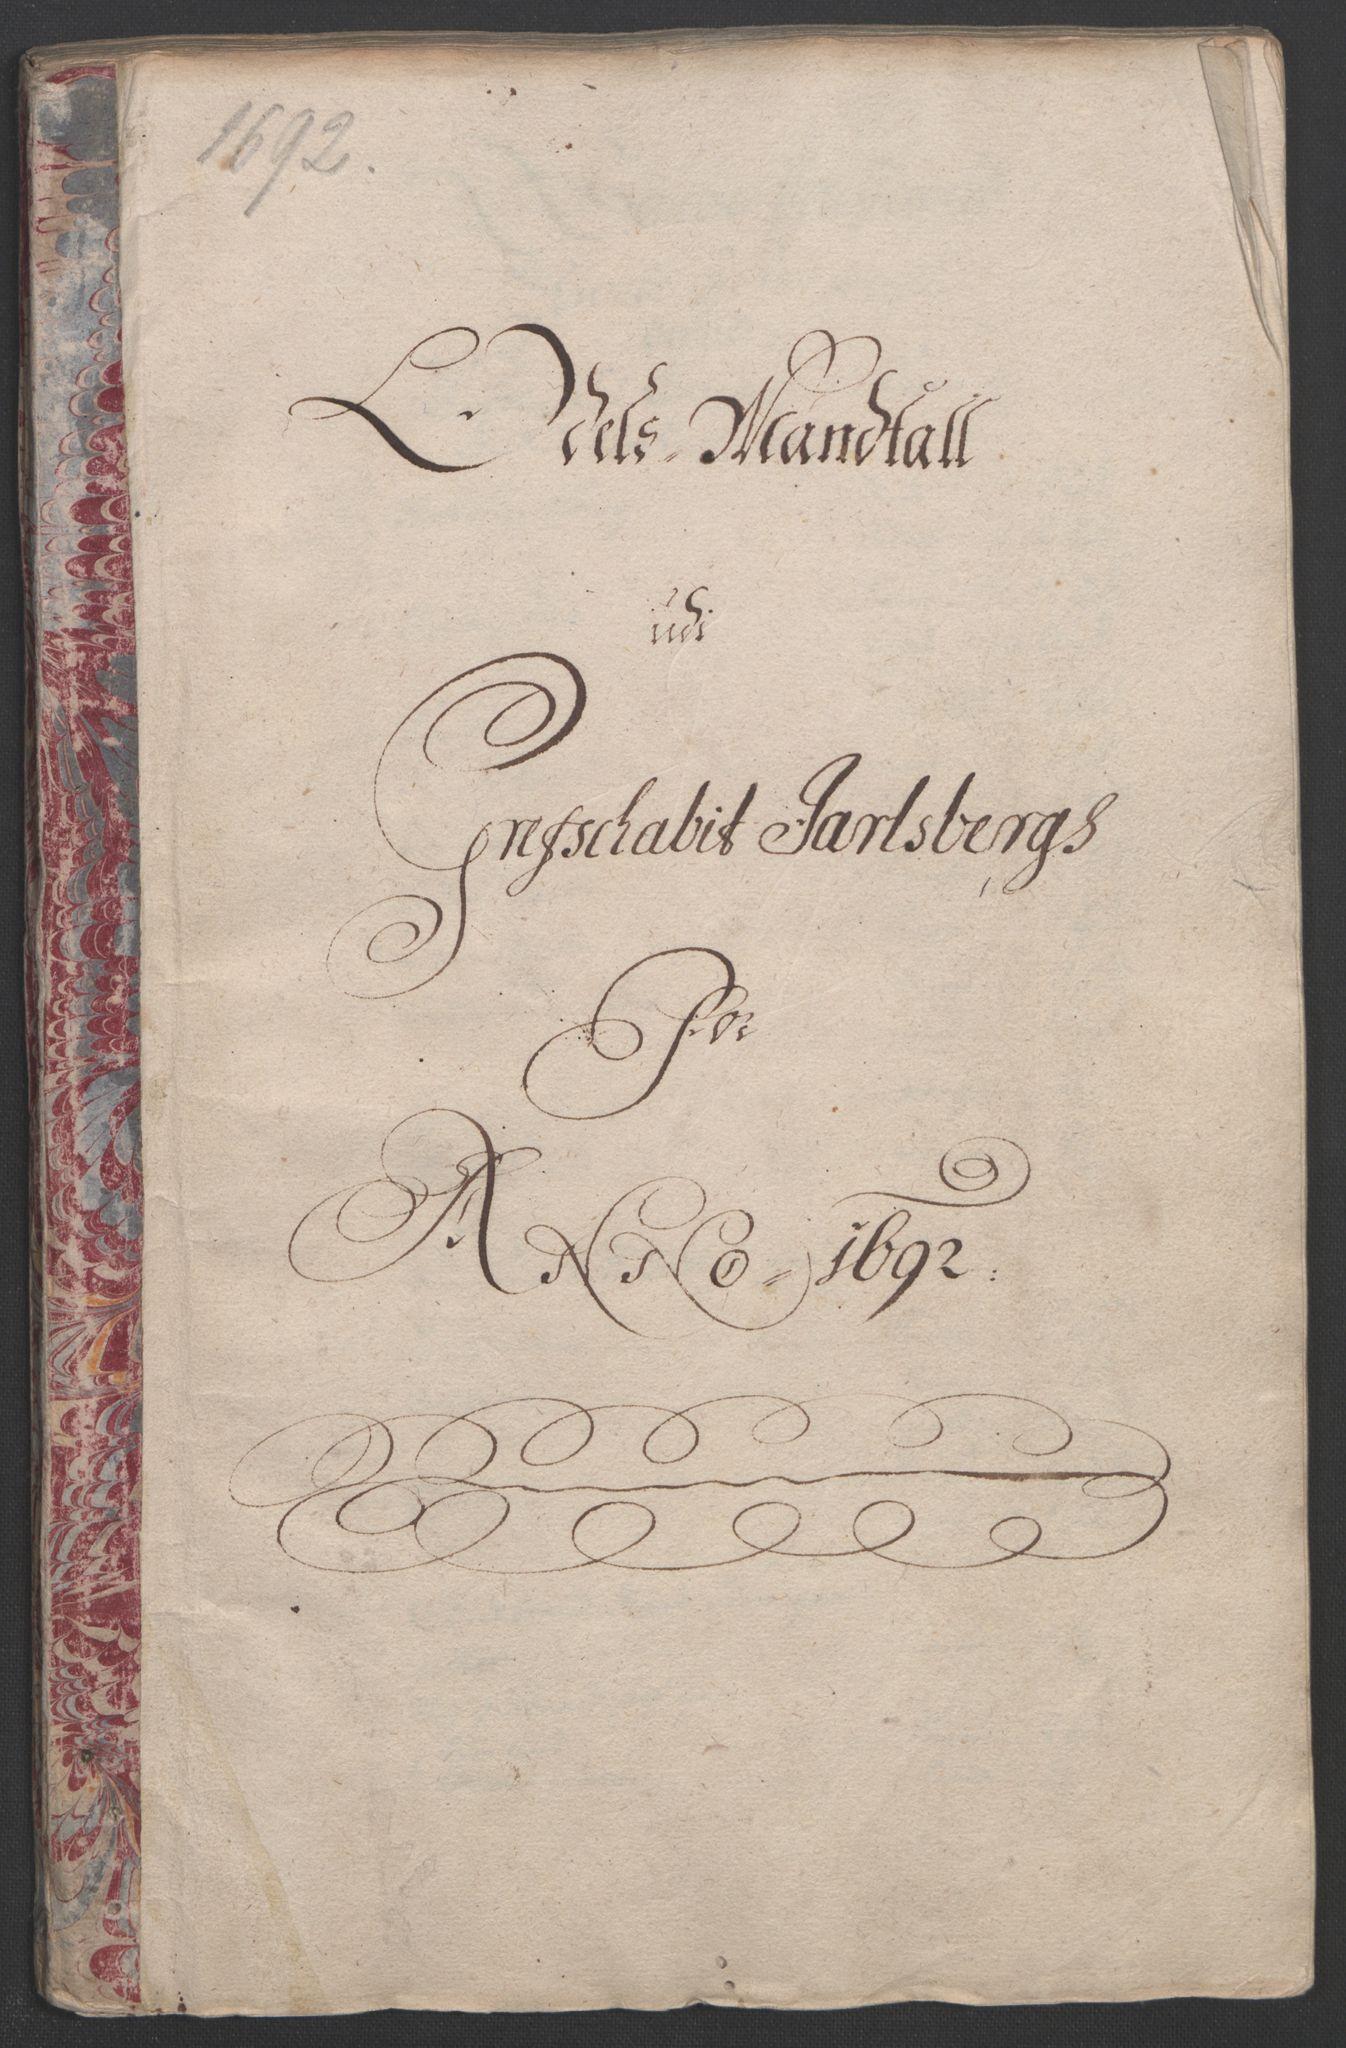 RA, Rentekammeret inntil 1814, Reviderte regnskaper, Fogderegnskap, R32/L1865: Fogderegnskap Jarlsberg grevskap, 1692, s. 145